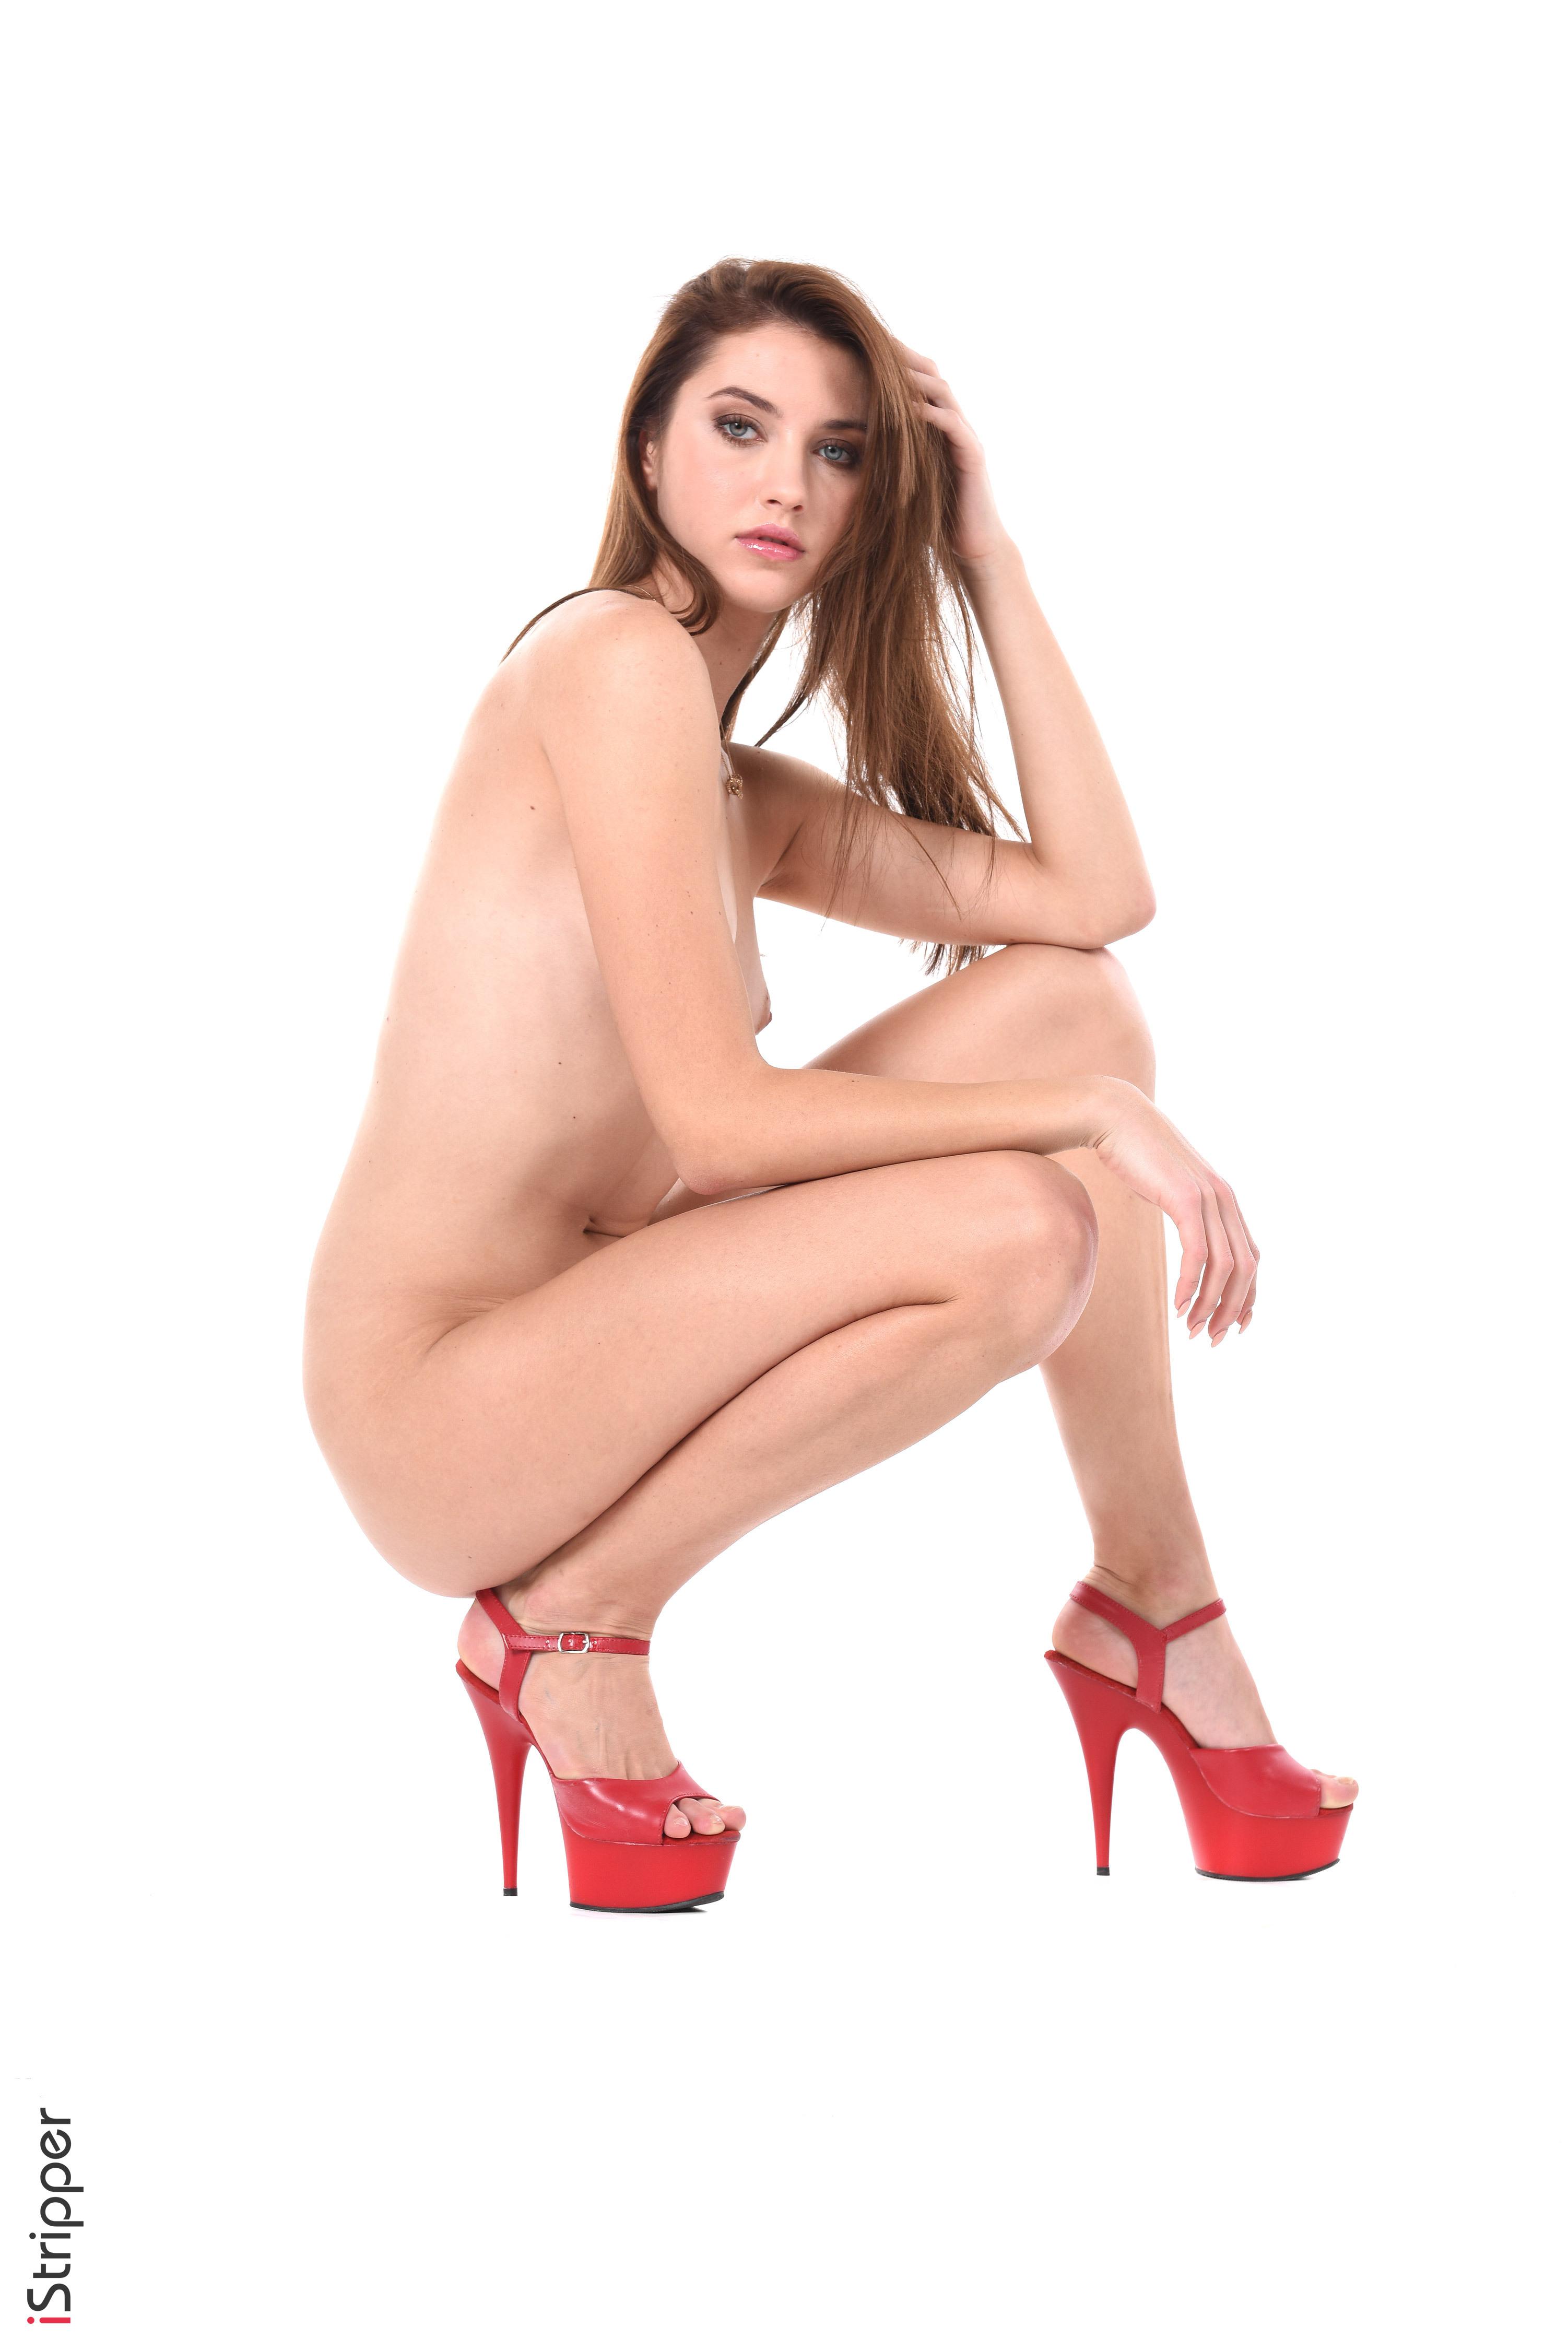 sexy wallpaper Website